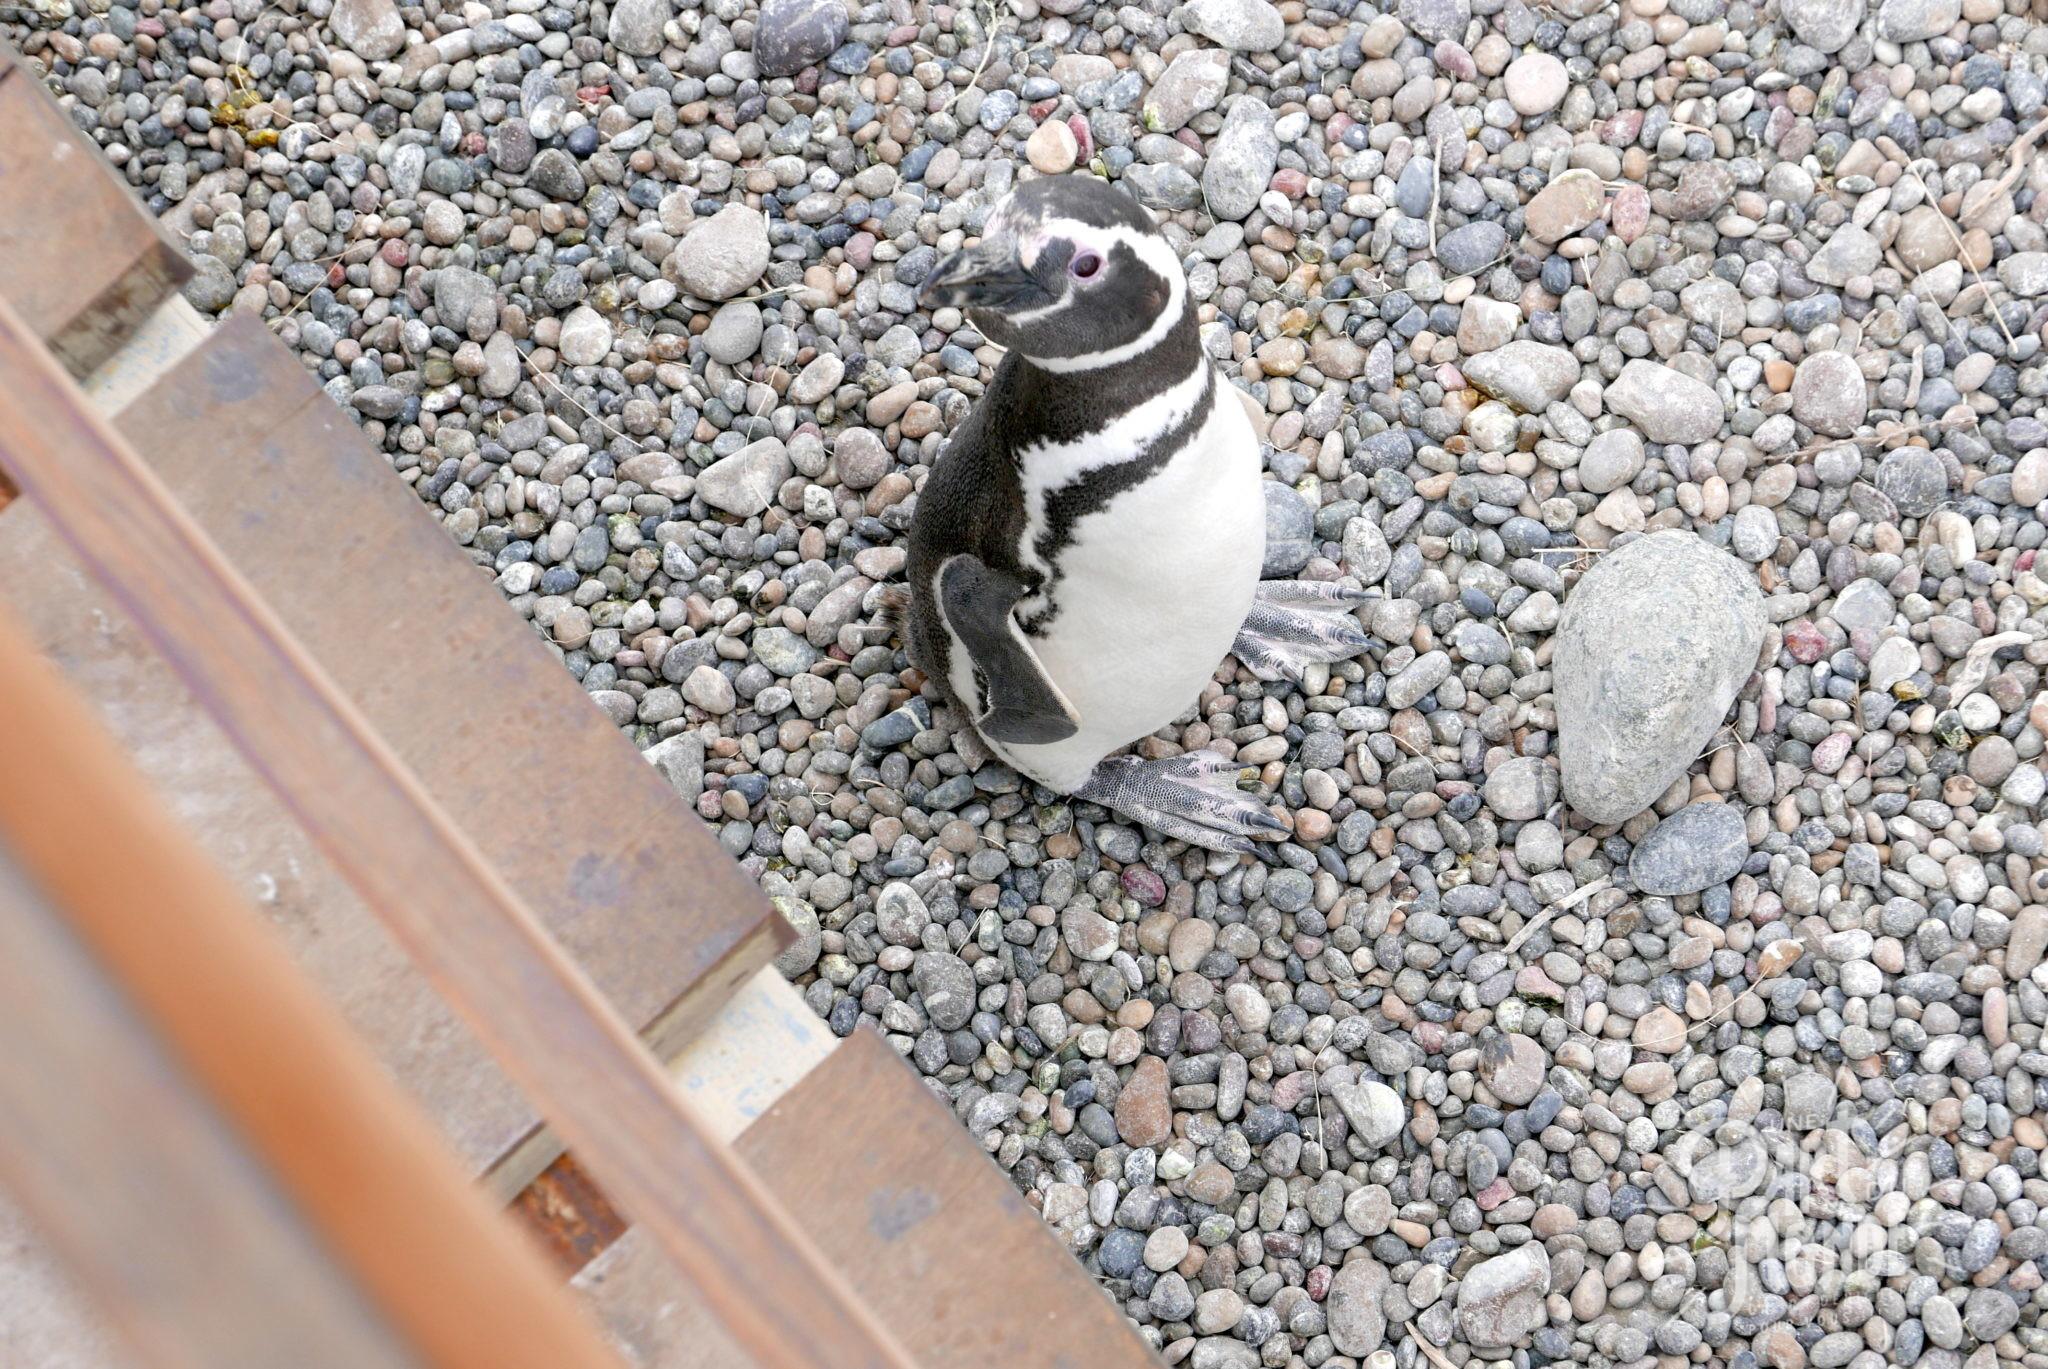 péninsule de valdès punta tombo pinguin 2